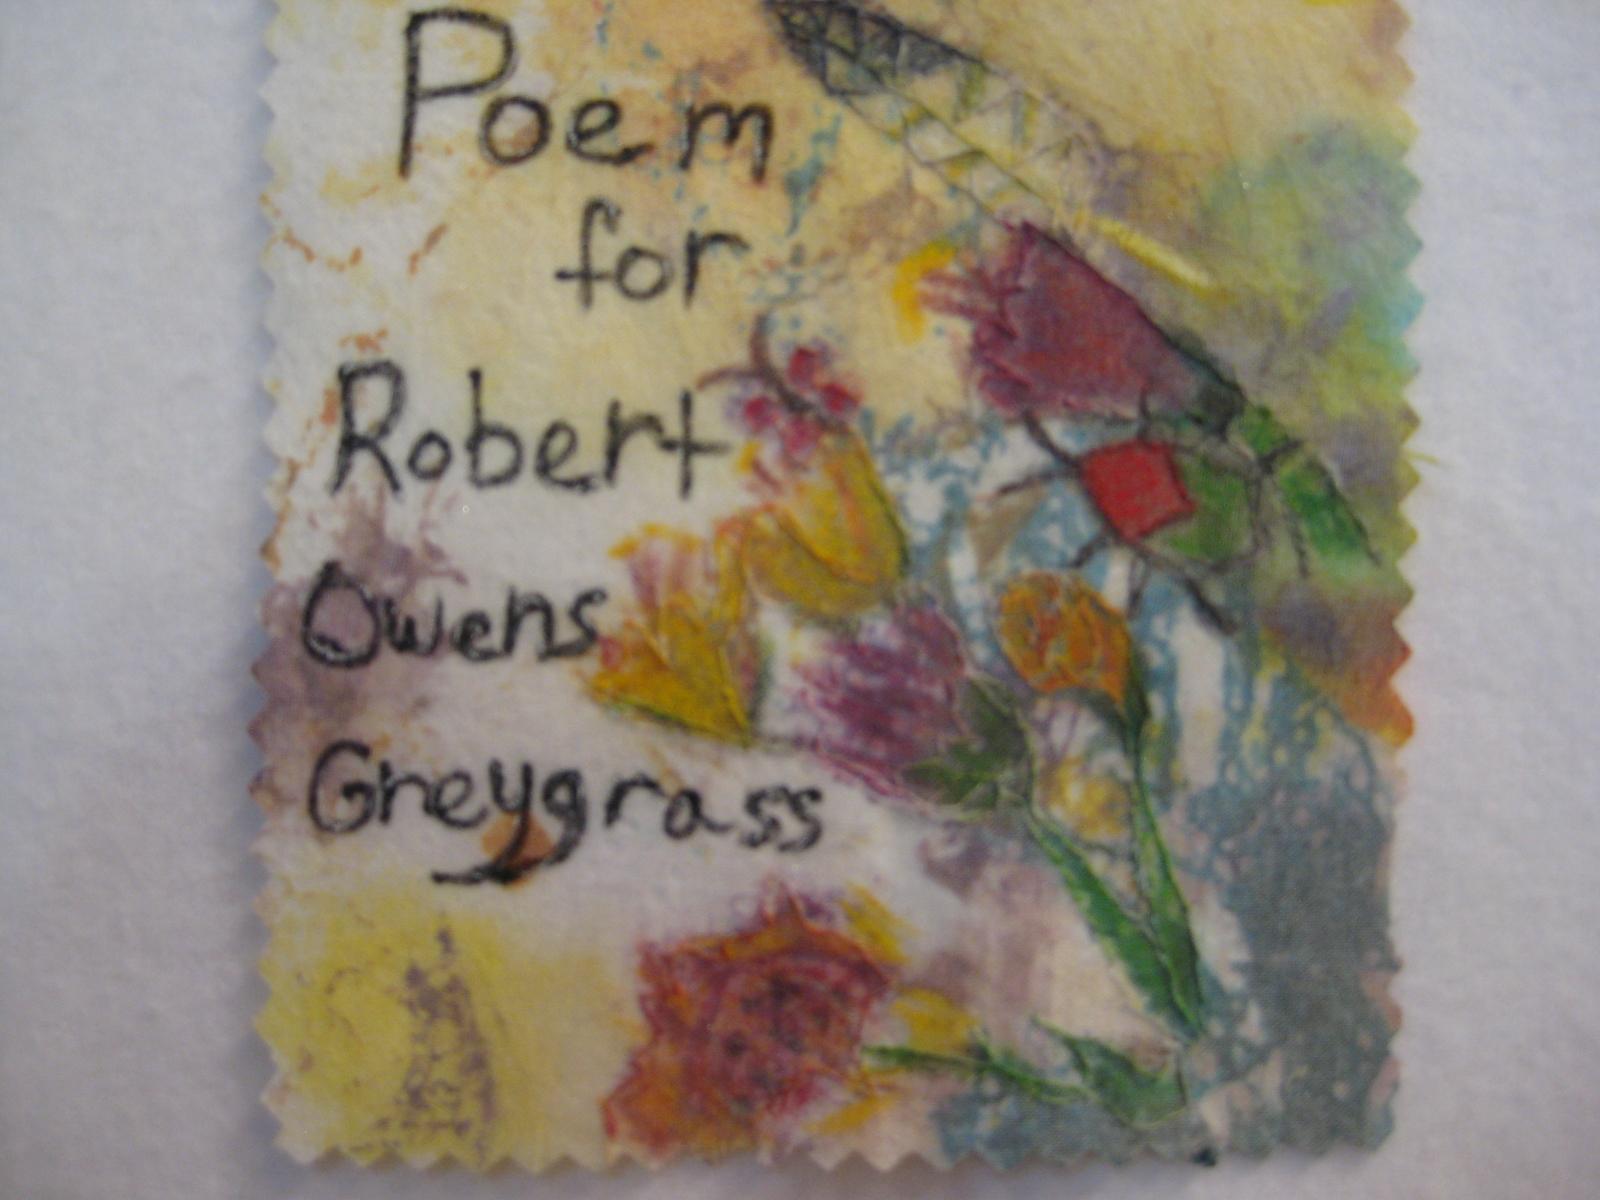 Poem for Robert Owens Greygrass